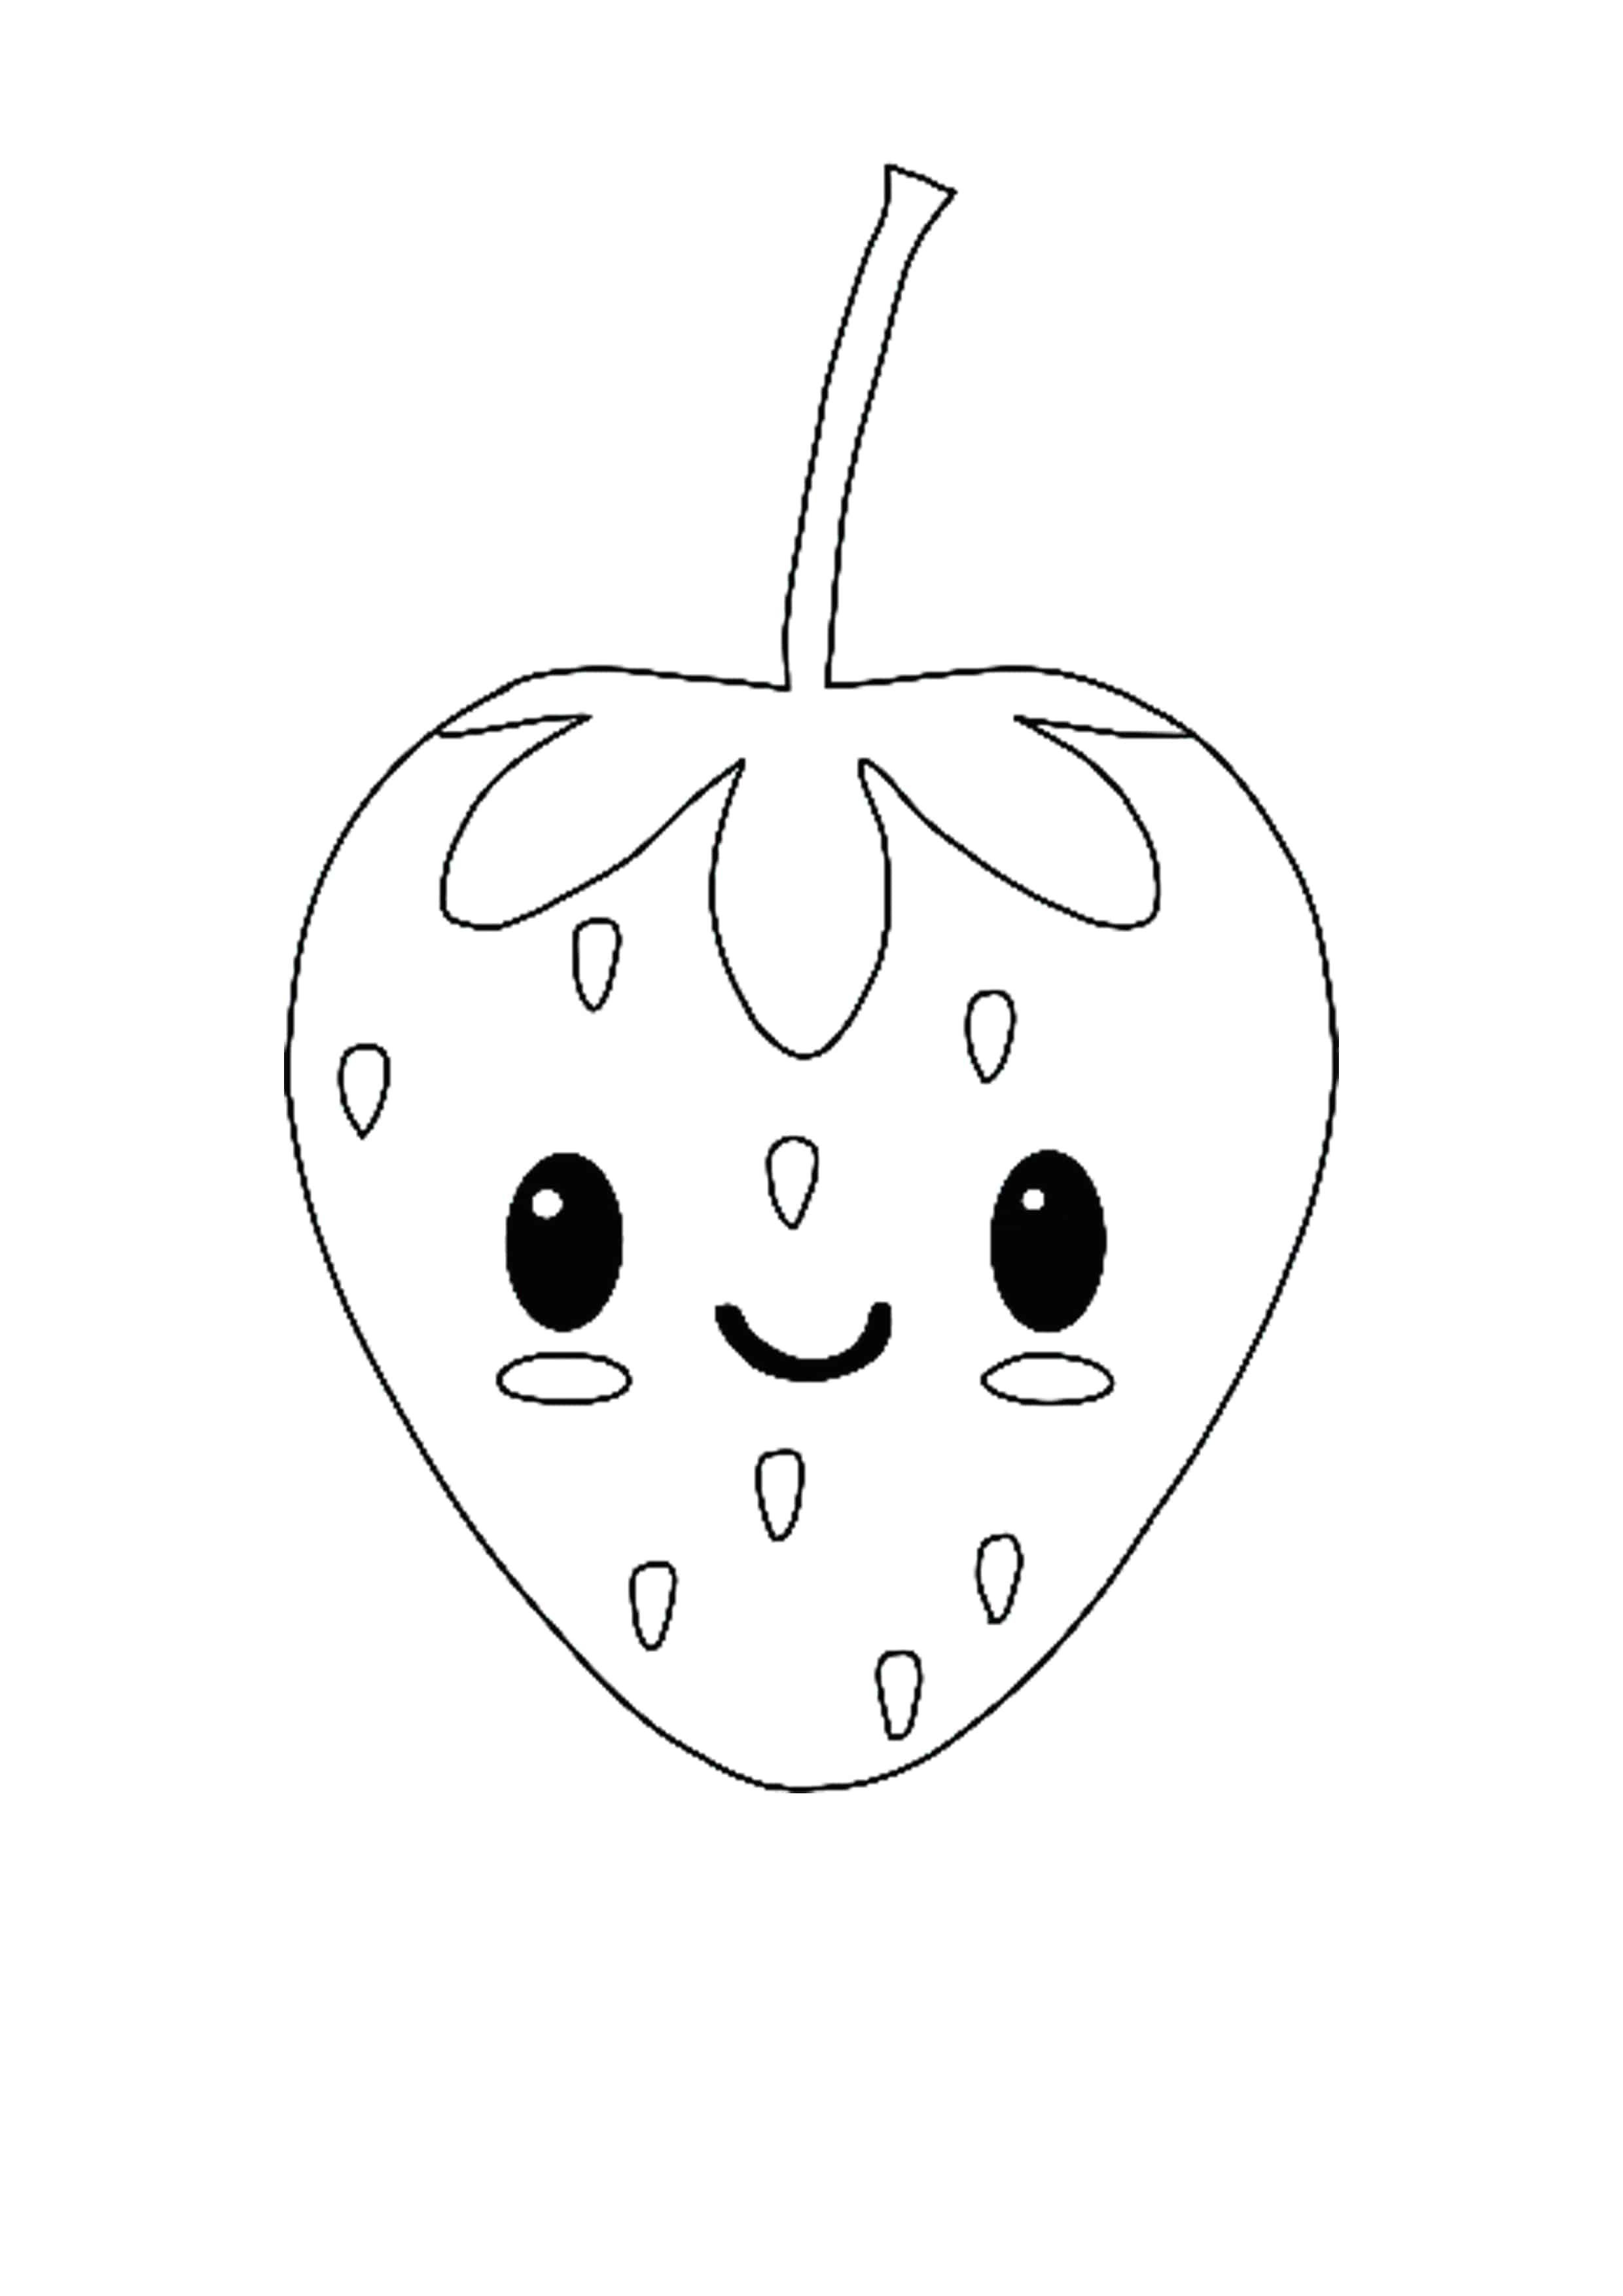 Kawaii Strawberry Coloring Page Kawaii Pineapple Coloring Pages Kawaii Fruit